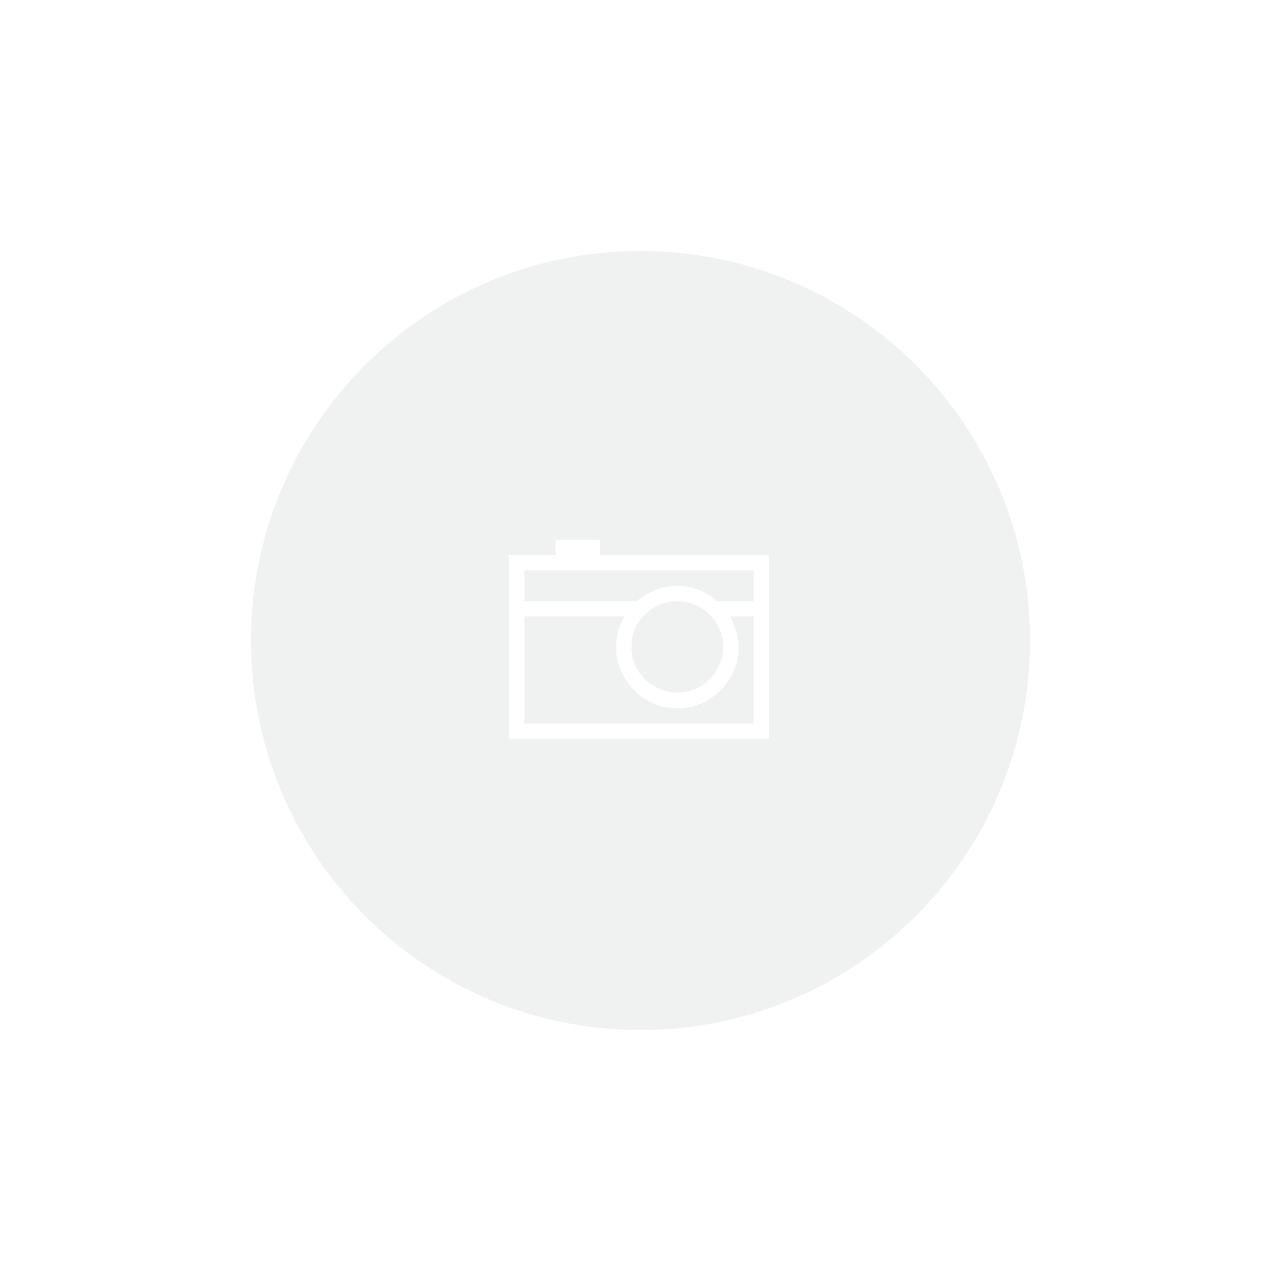 Panela Inox 24Cm 4,70 Litros Profissional Tramontina